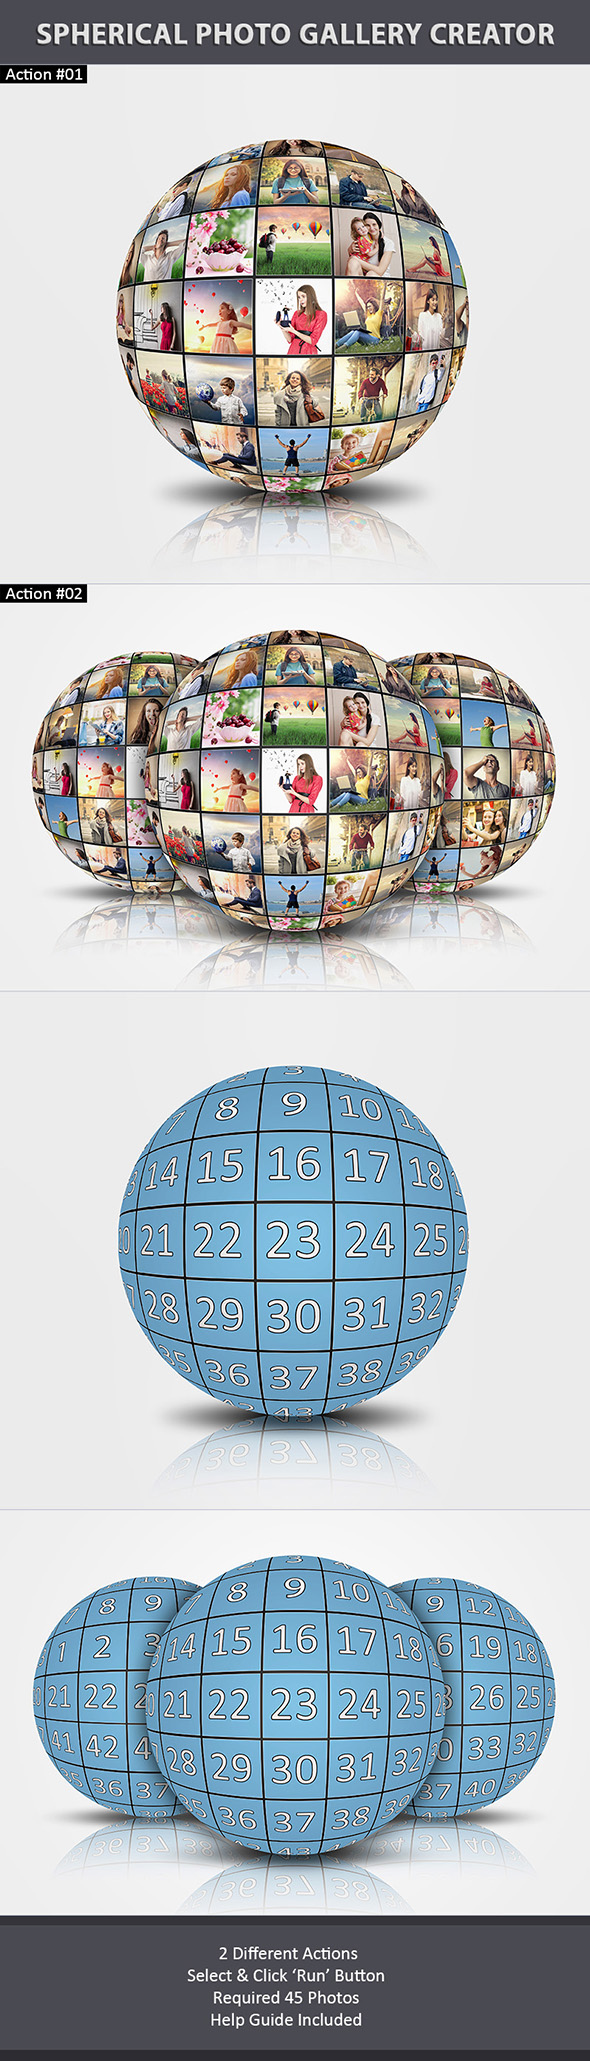 Spherical Photo Gallery Creator